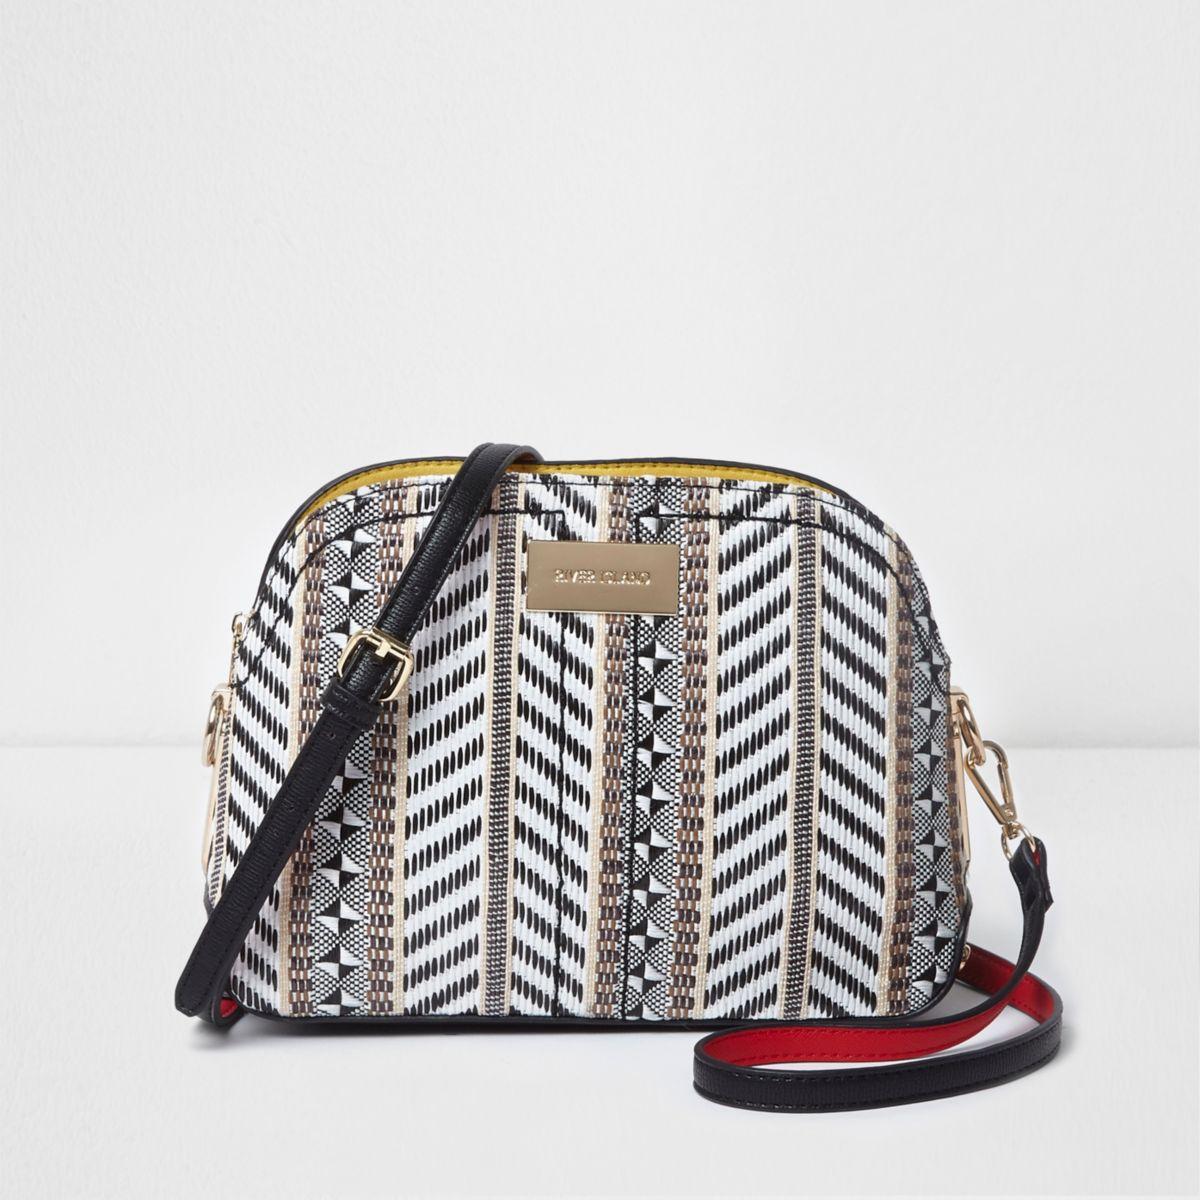 Black mixed weave cross body bag